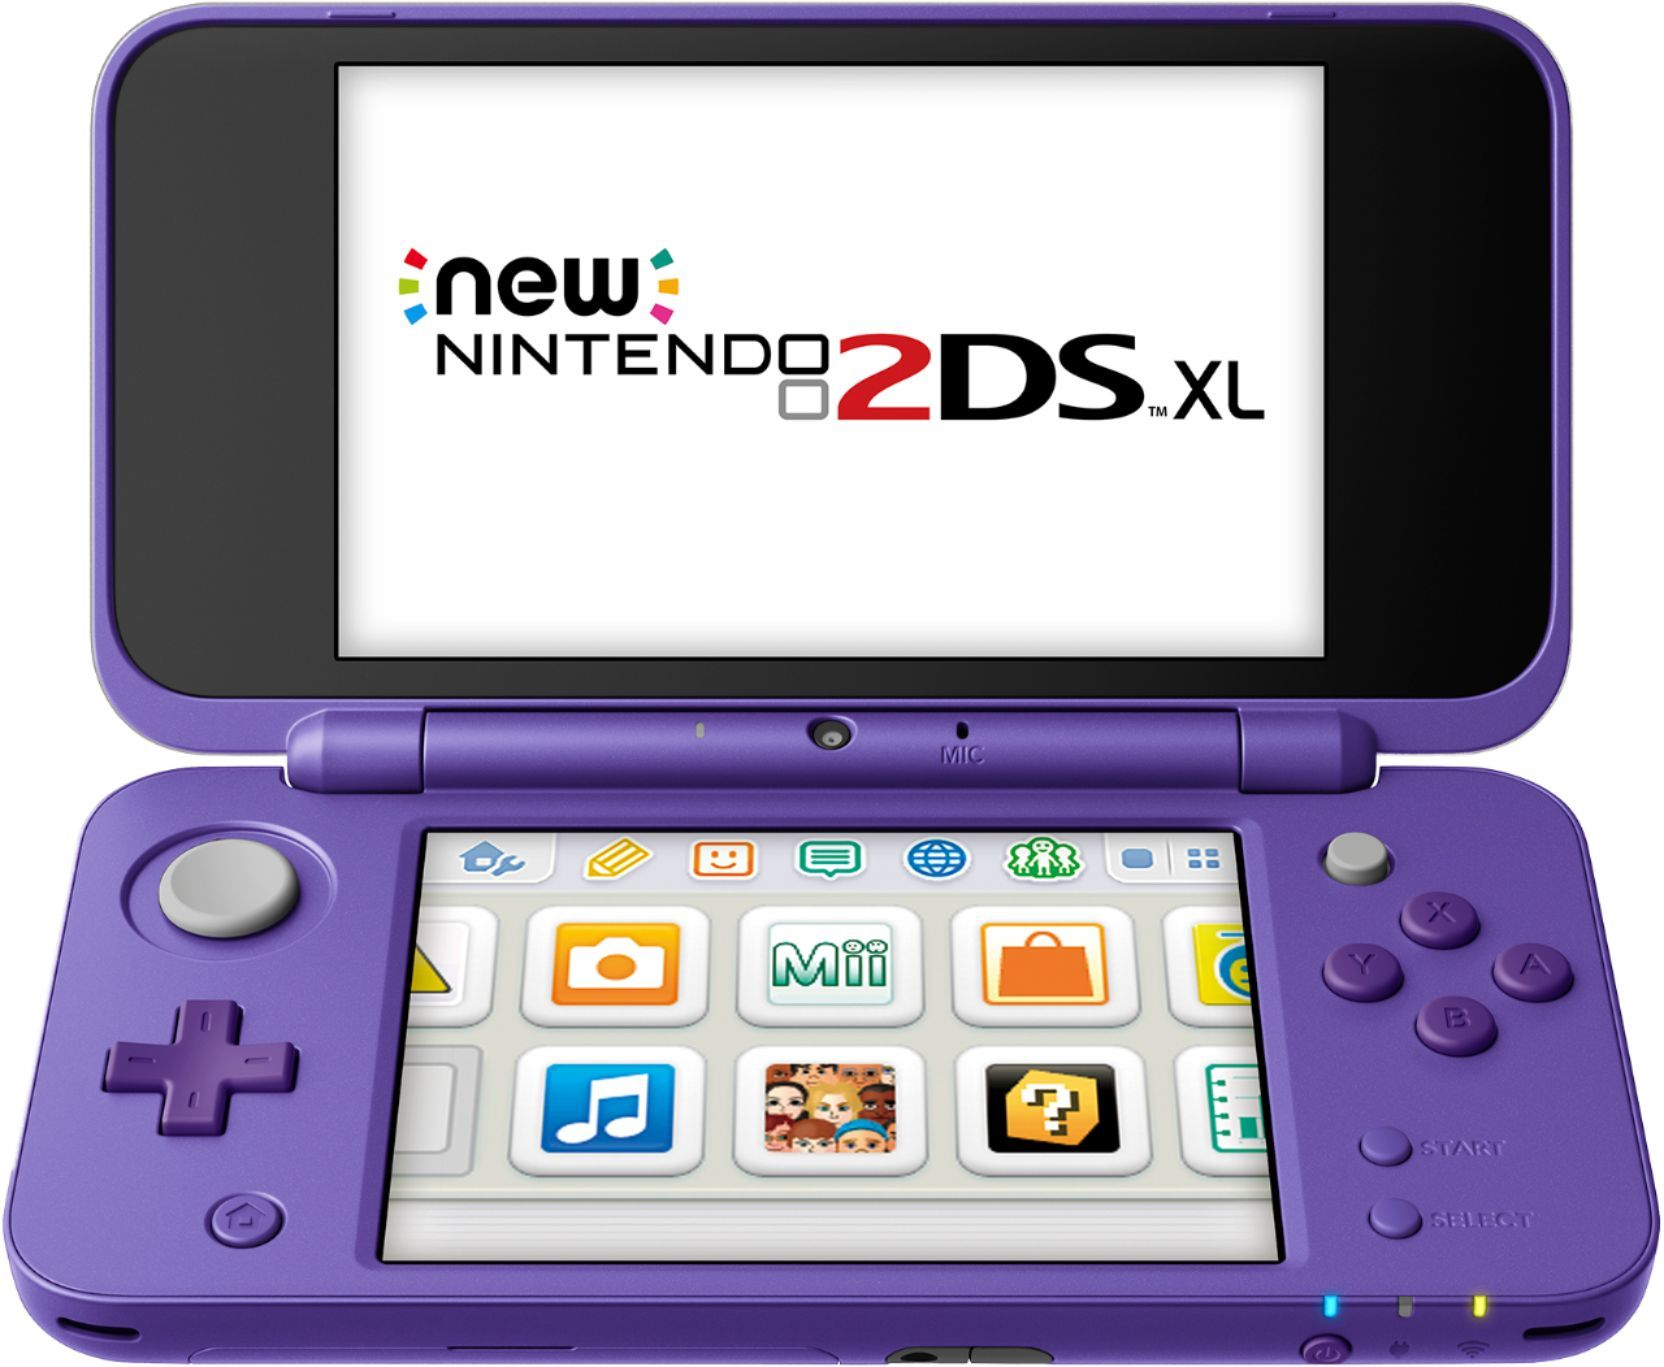 New Nintendo 2ds Xl Mario Kart 7 Bundle Purple Silver Jansvbdb Nintendo 2ds Nintendo Handheld Portable Gaming Console